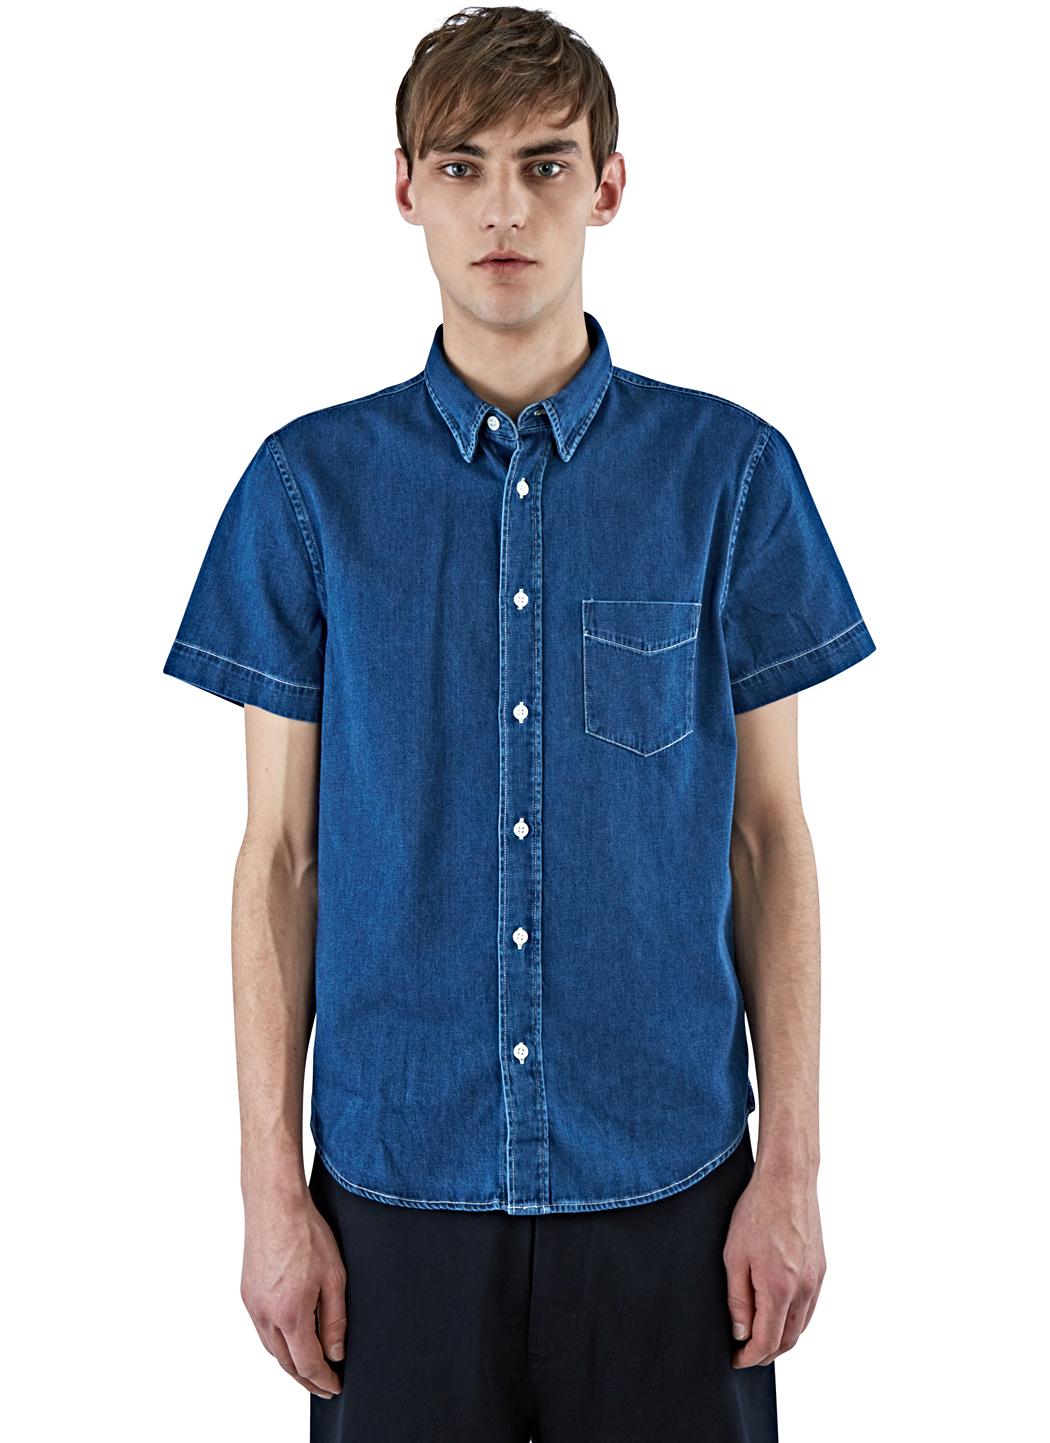 98304c1c03 Lyst - Acne Studios Men s Isherwood Short Sleeved Denim Shirt In ...